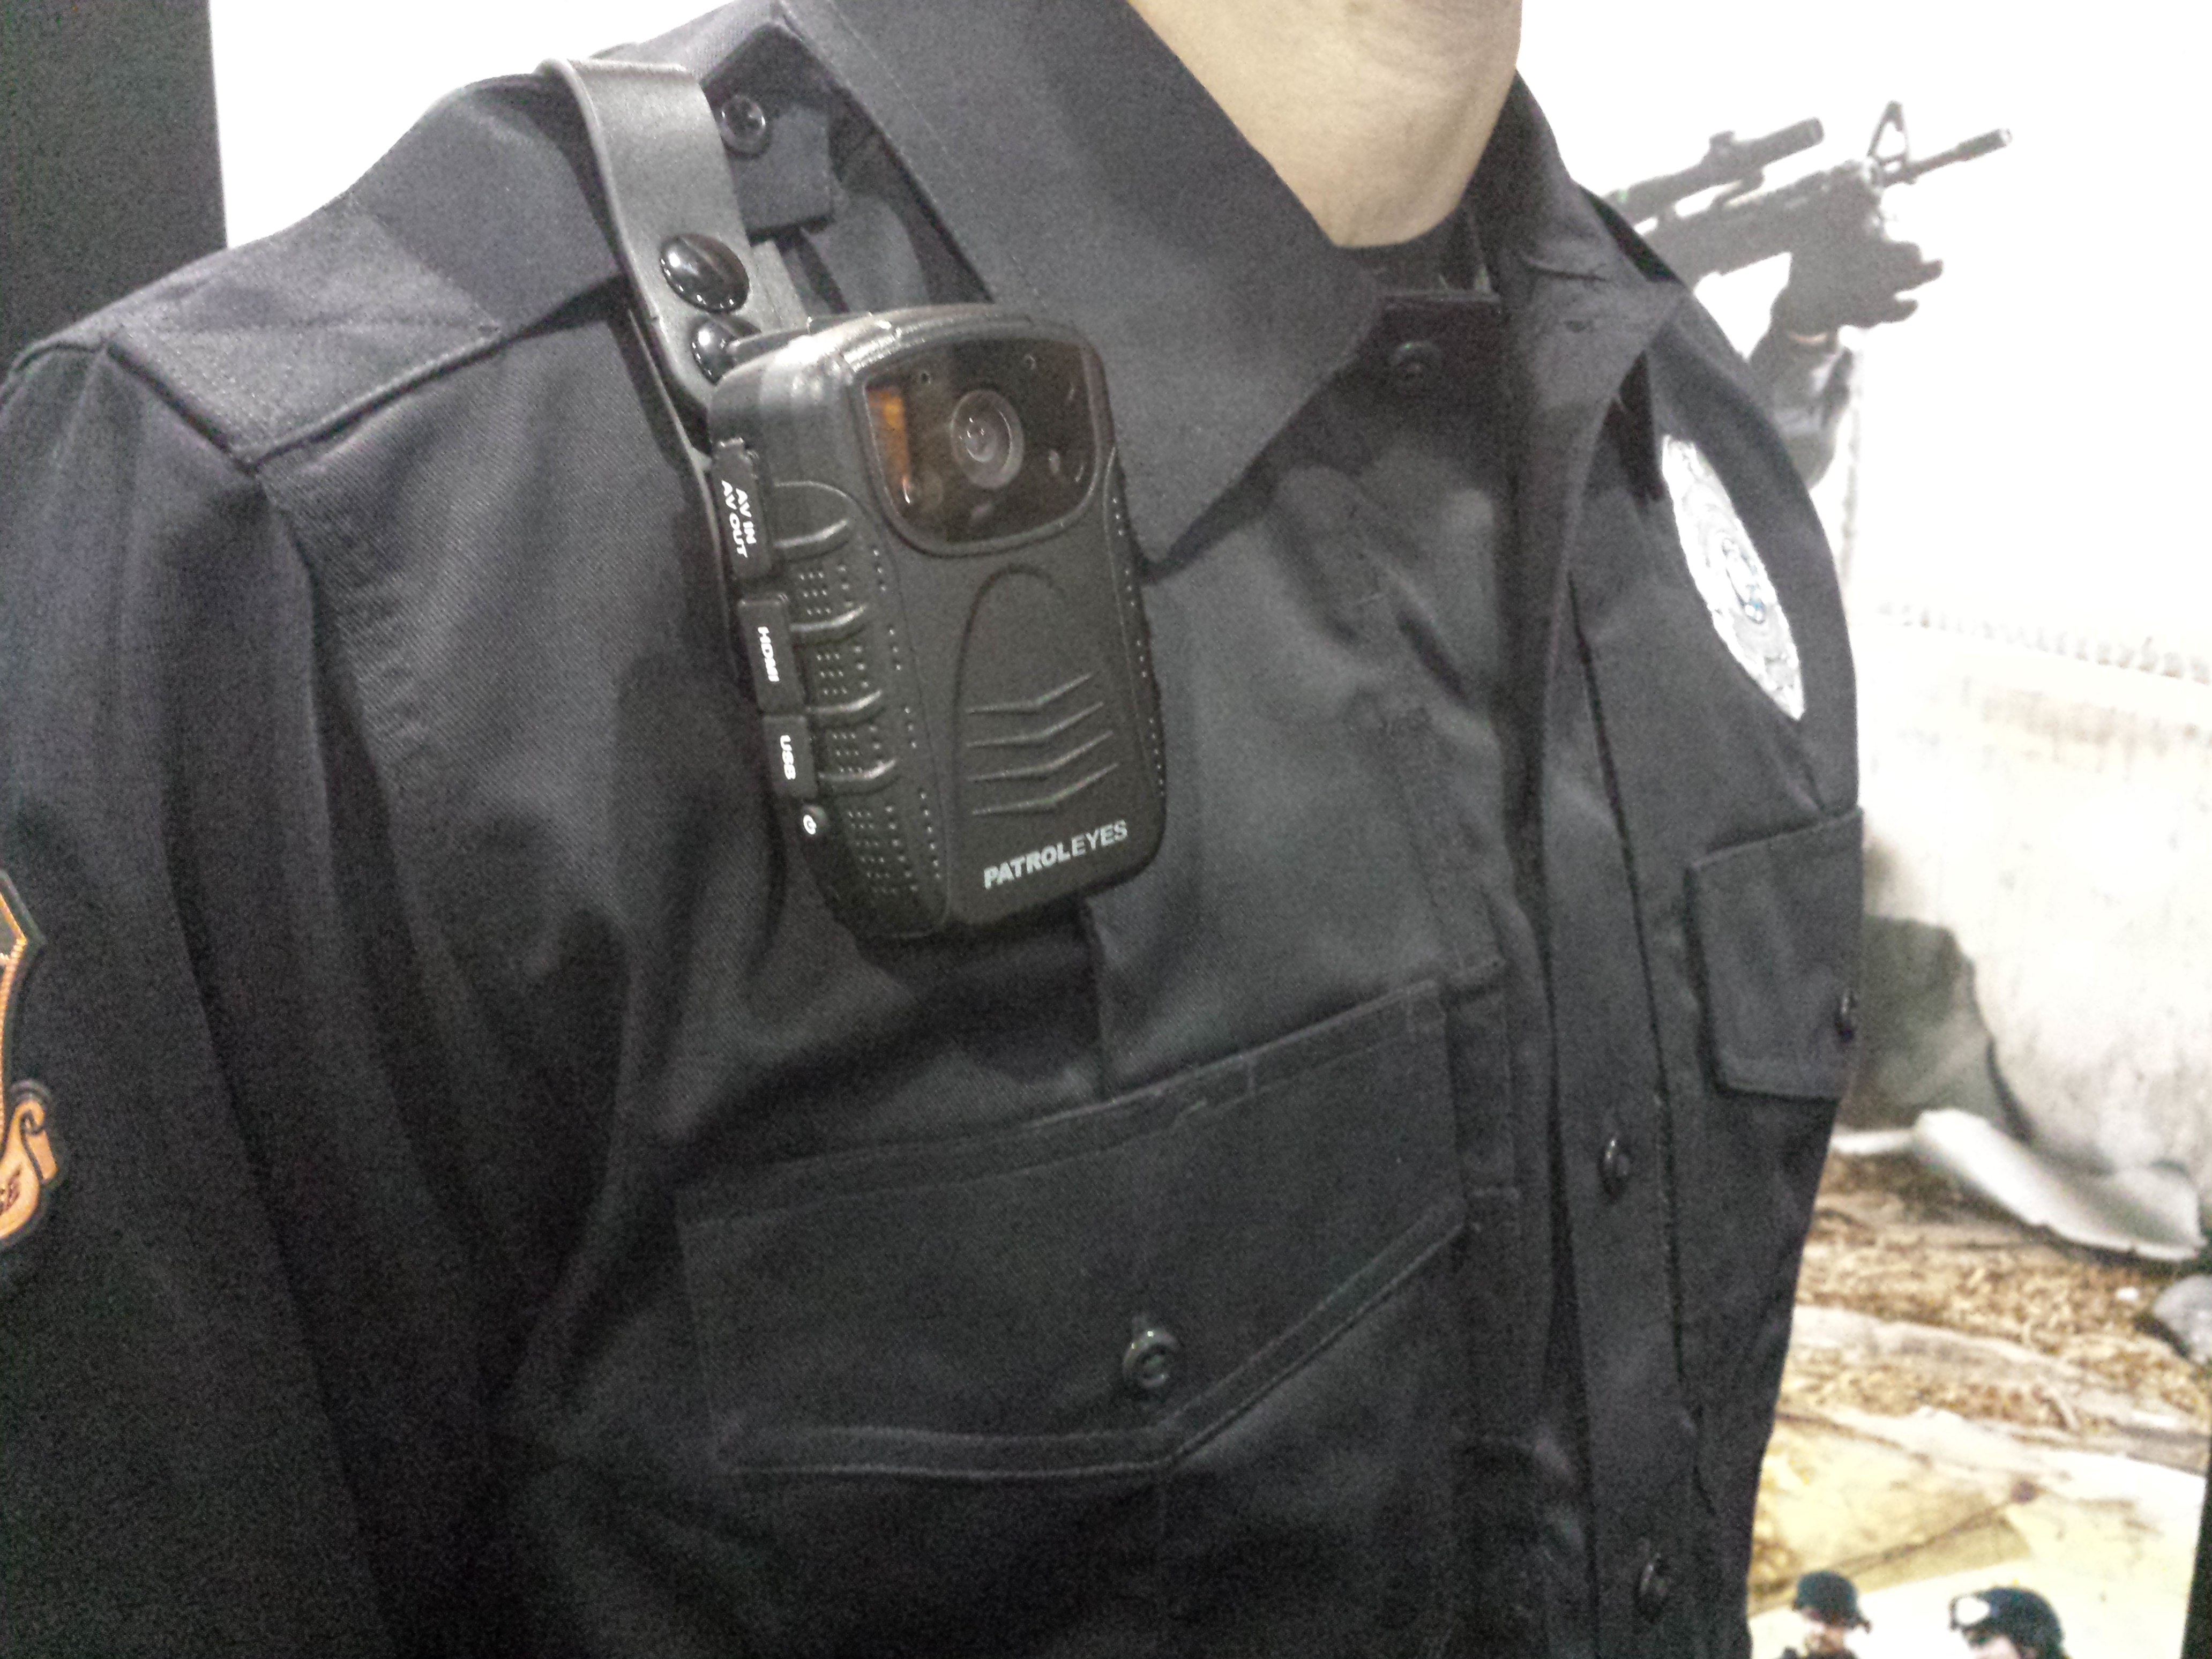 Gopro Police Body Cams Police Body Cameras Wearable Cams